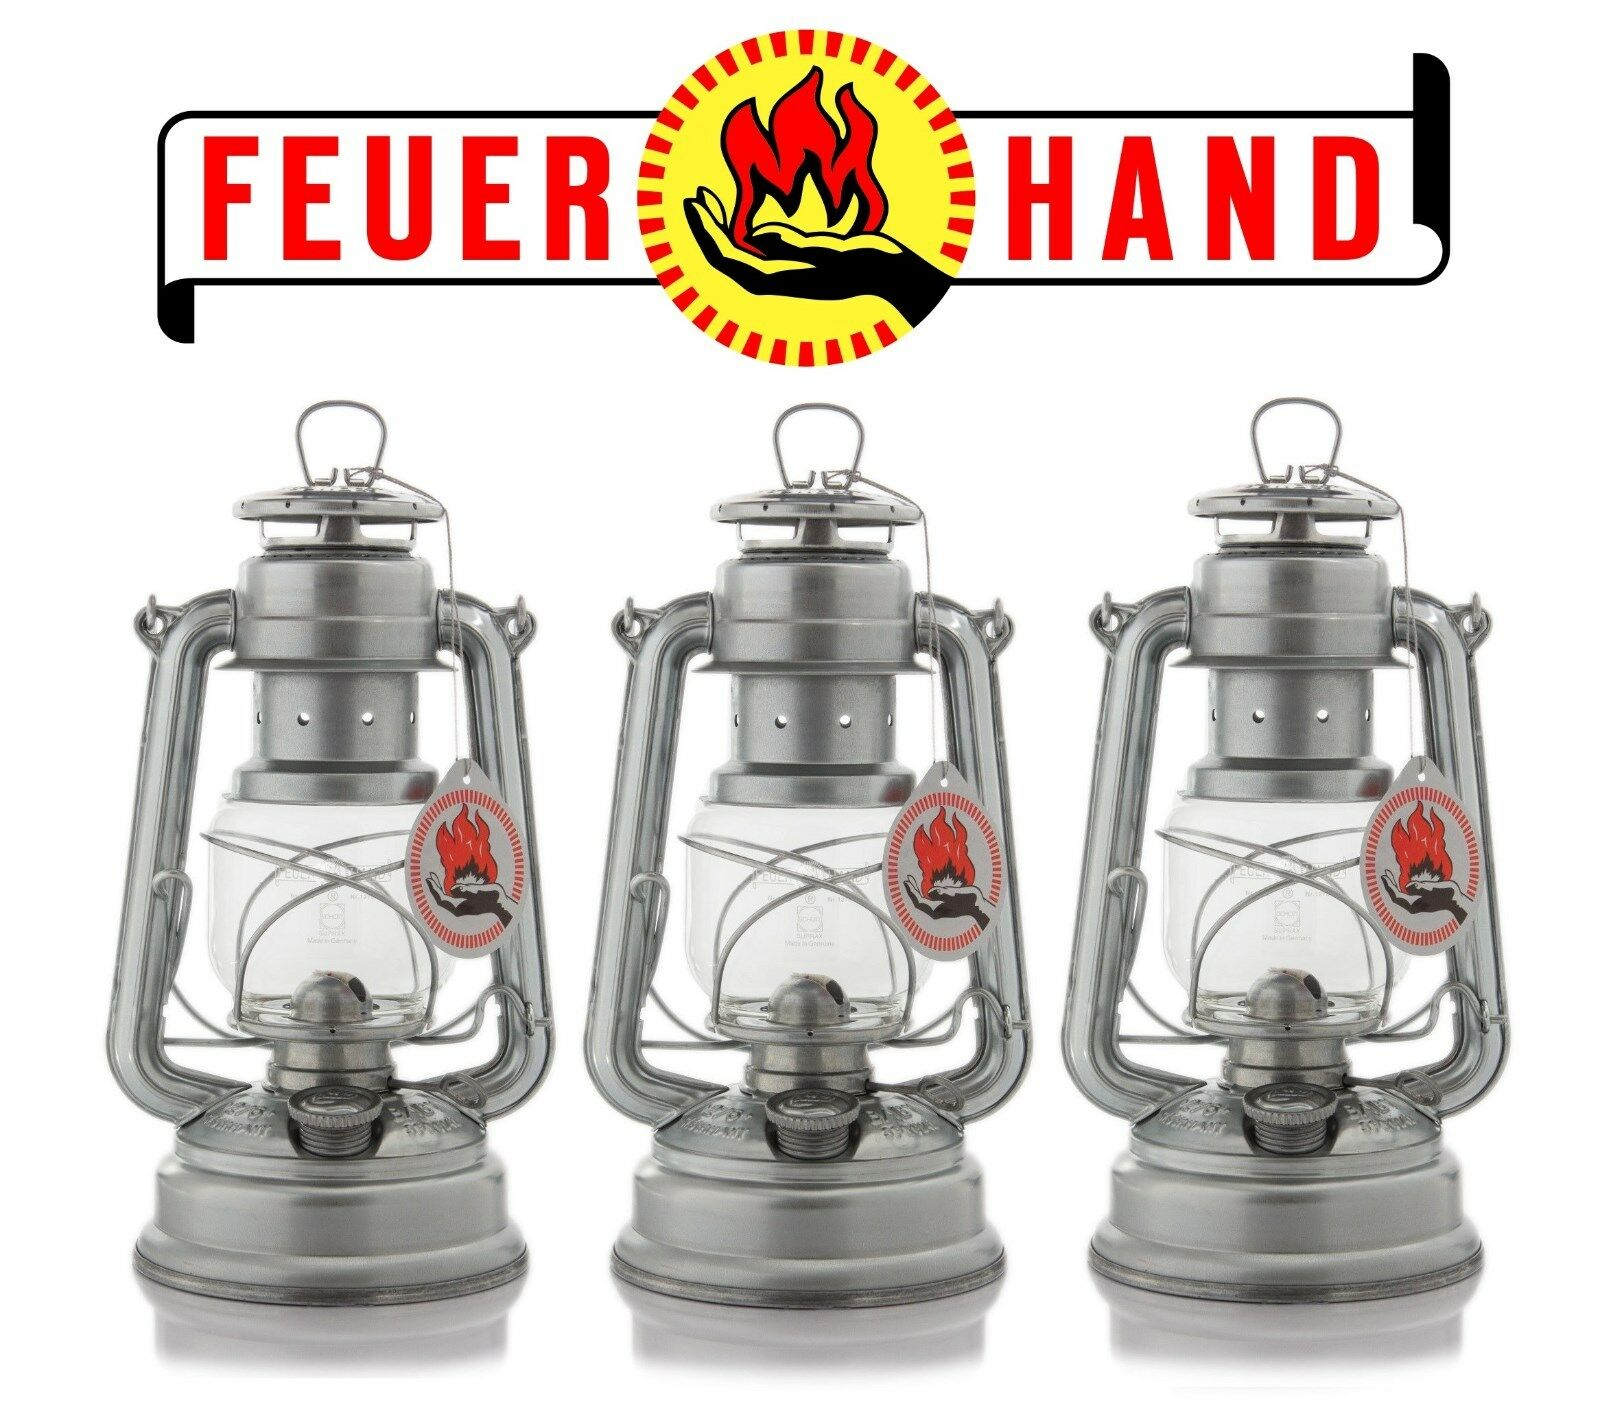 3x Feuerhand 276 Baby Special Petroleumlampe Laterne Lampe Sturmlaterne